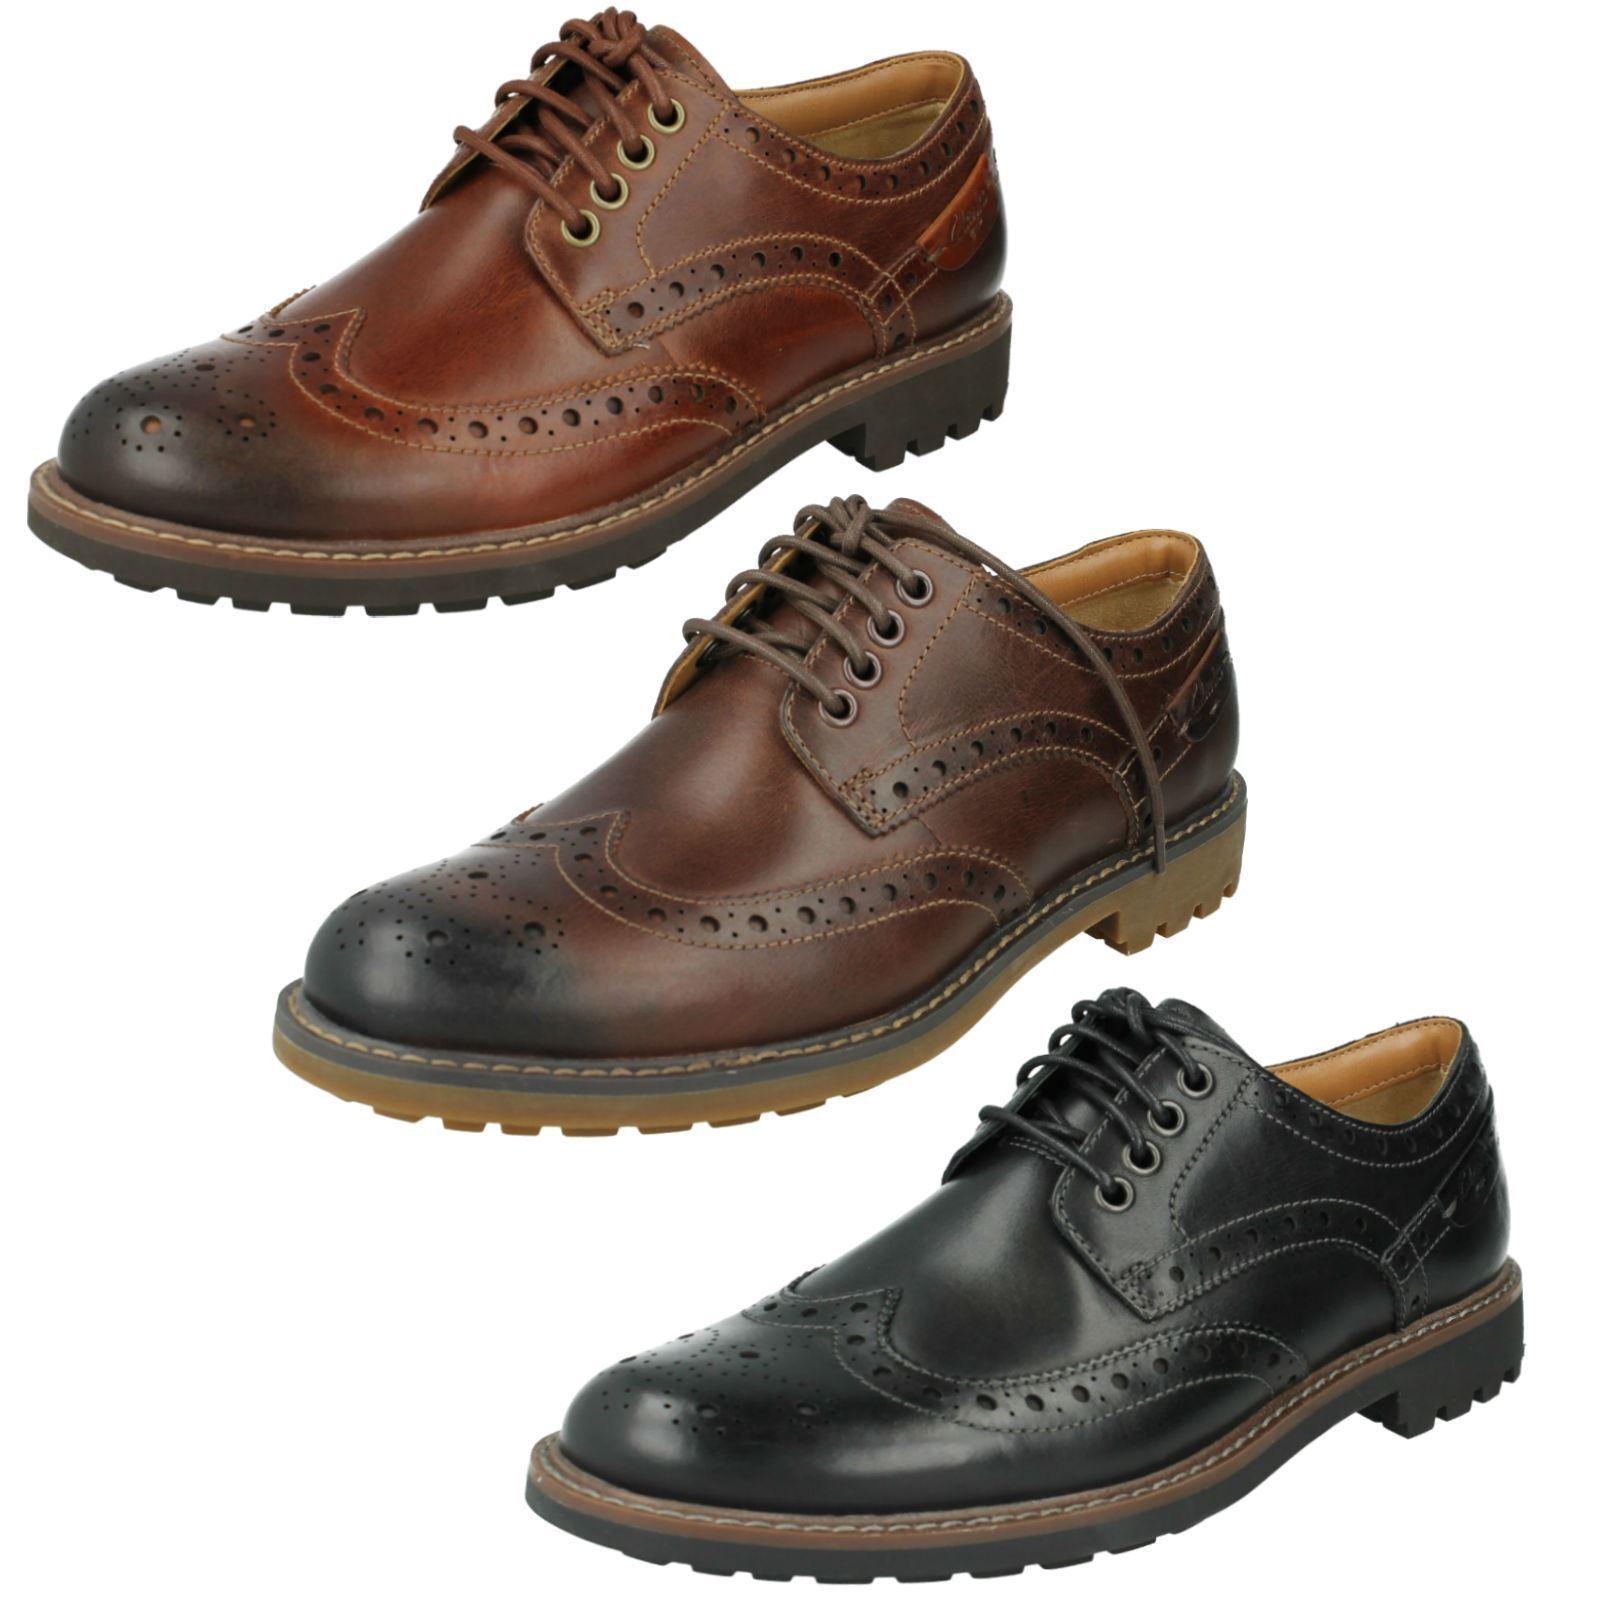 Men's Clarks Formal Shoes Label - Montacute Wing